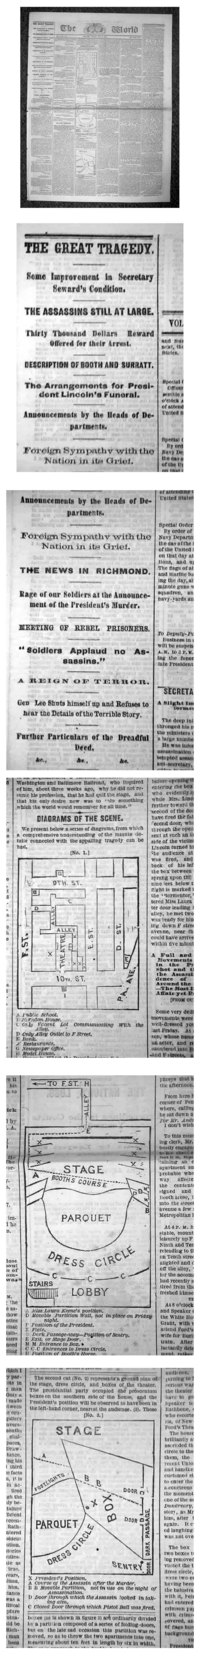 191216